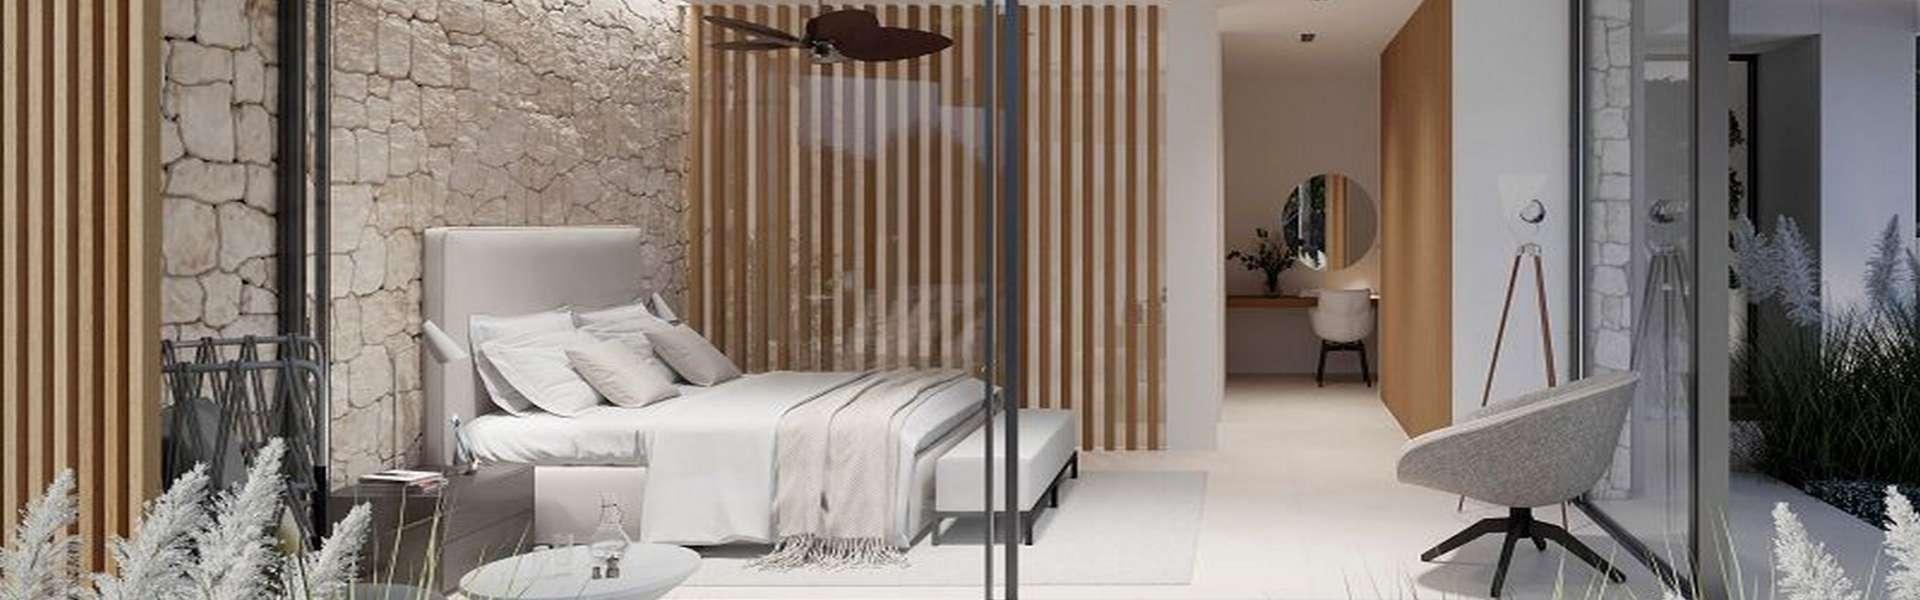 Santa Ponsa/Nova Santa Ponsa - Beeindruckende Design-Neubauvilla